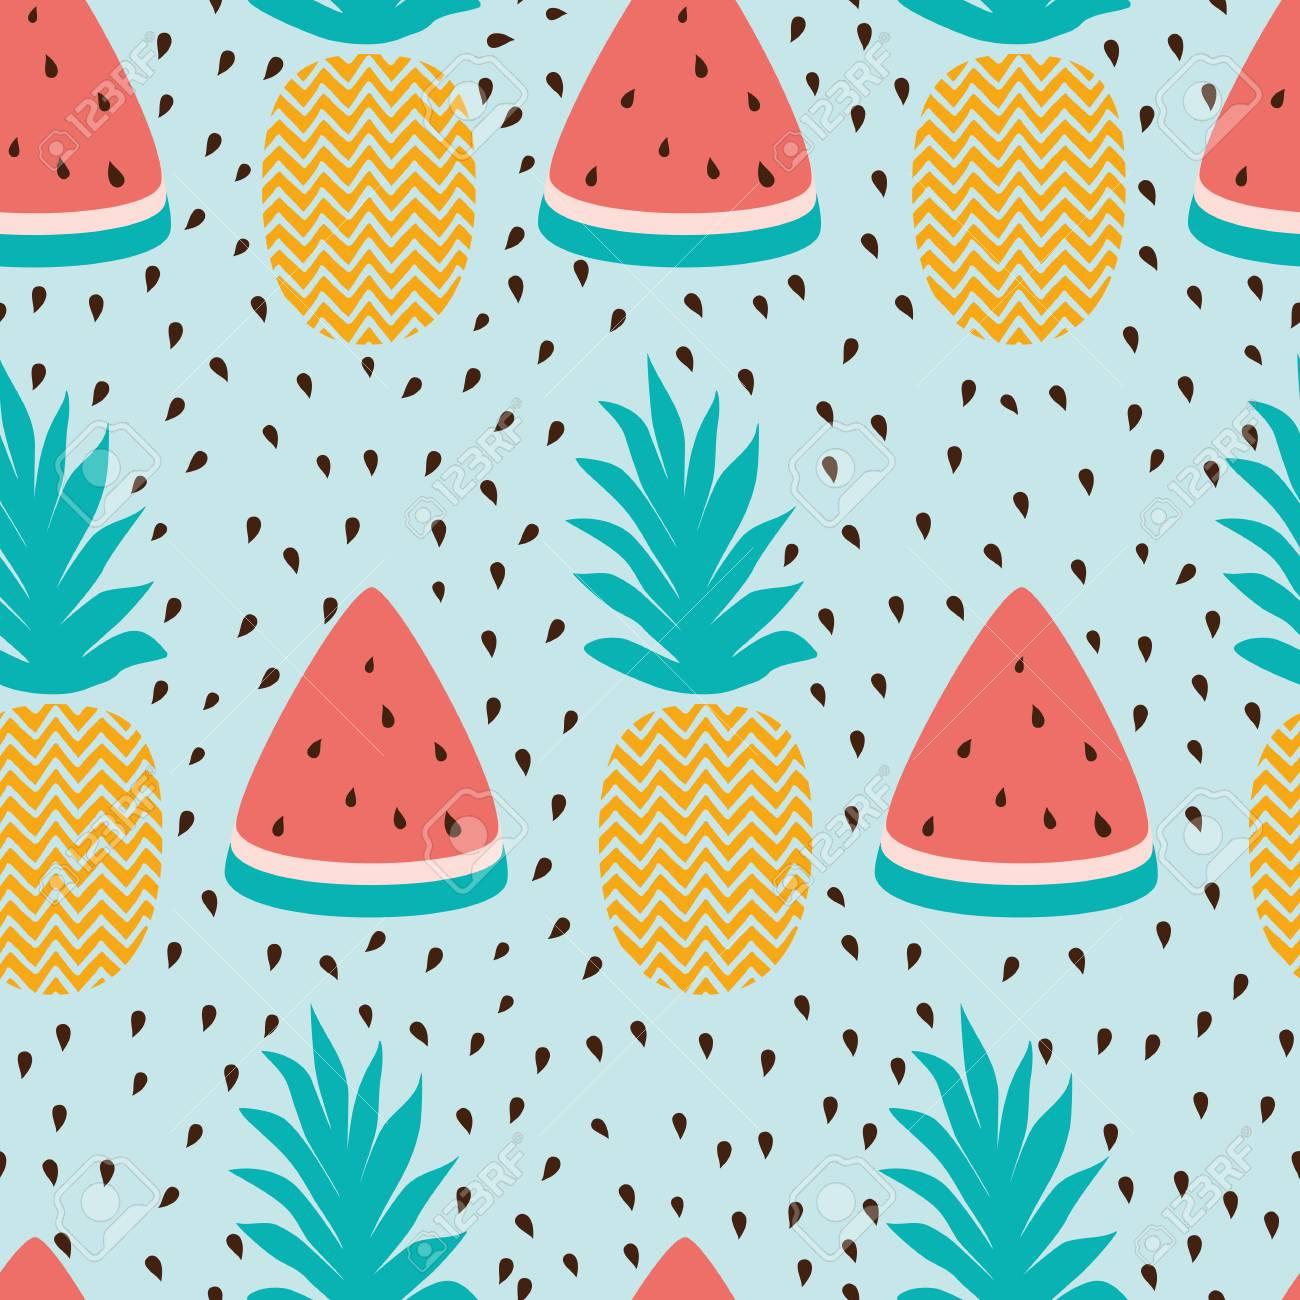 126887794 seamless wallpaper pattern with watermelon slices pineapple summer fresh fruit design vector illustr